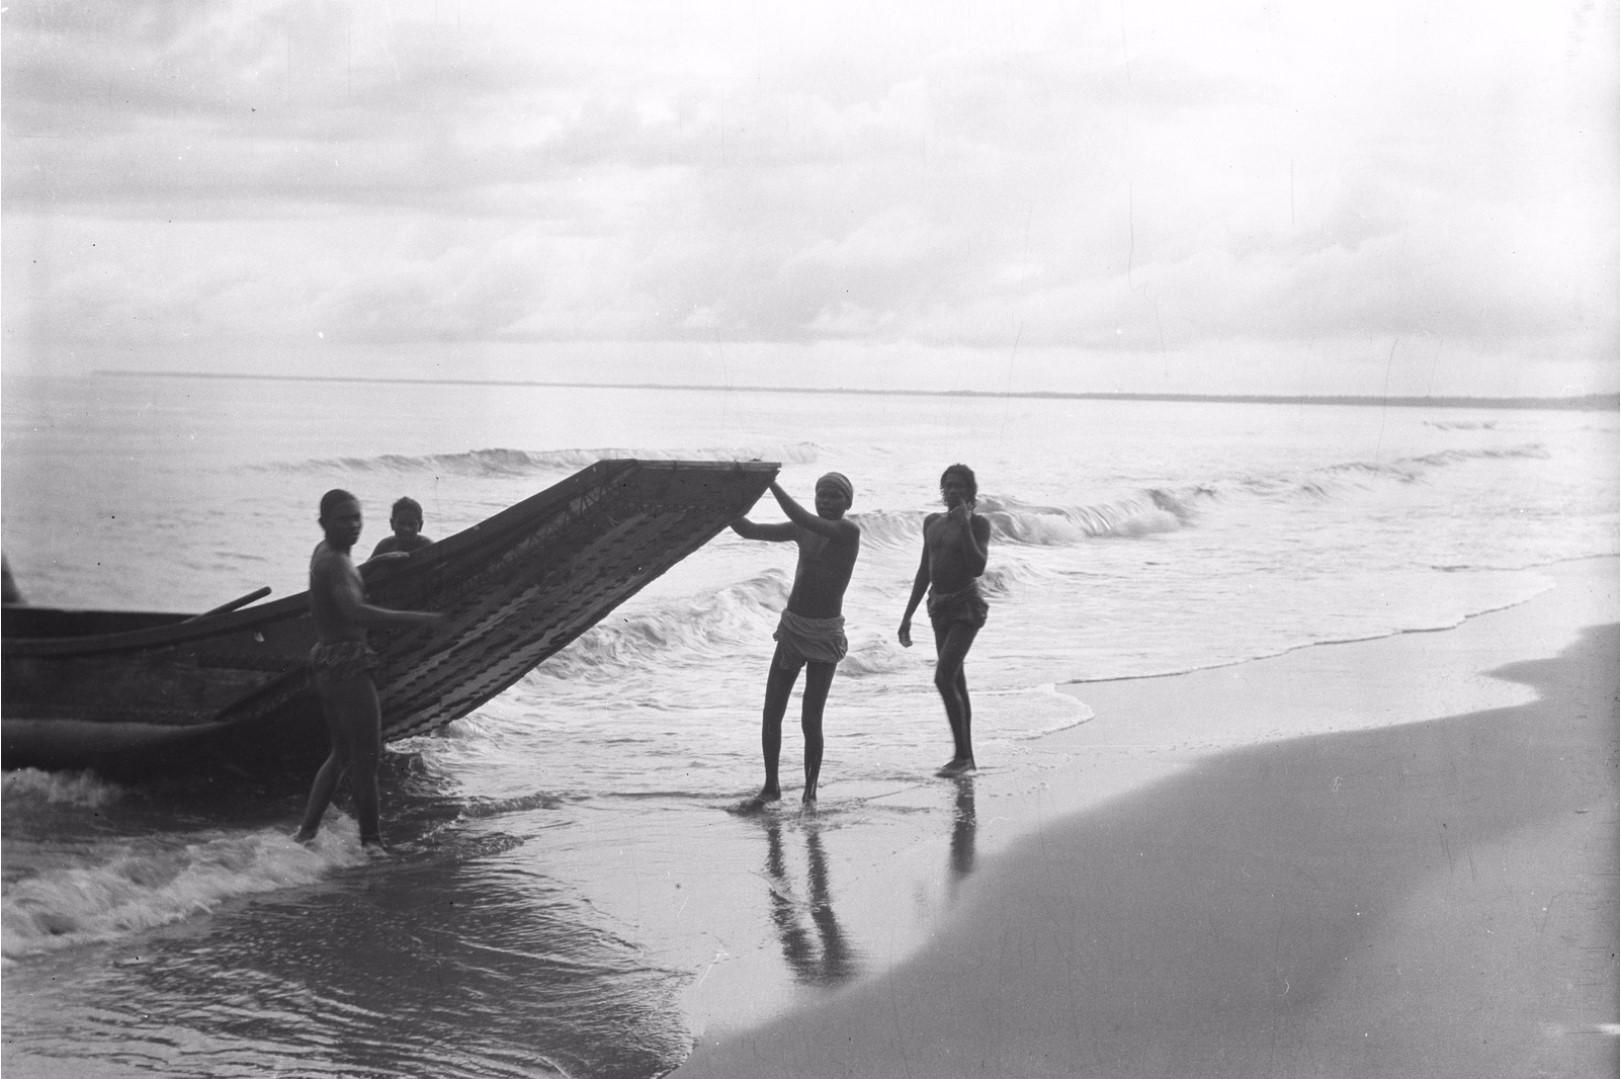 272. Калкуда. Рыбаки вытягивают лодку на берег